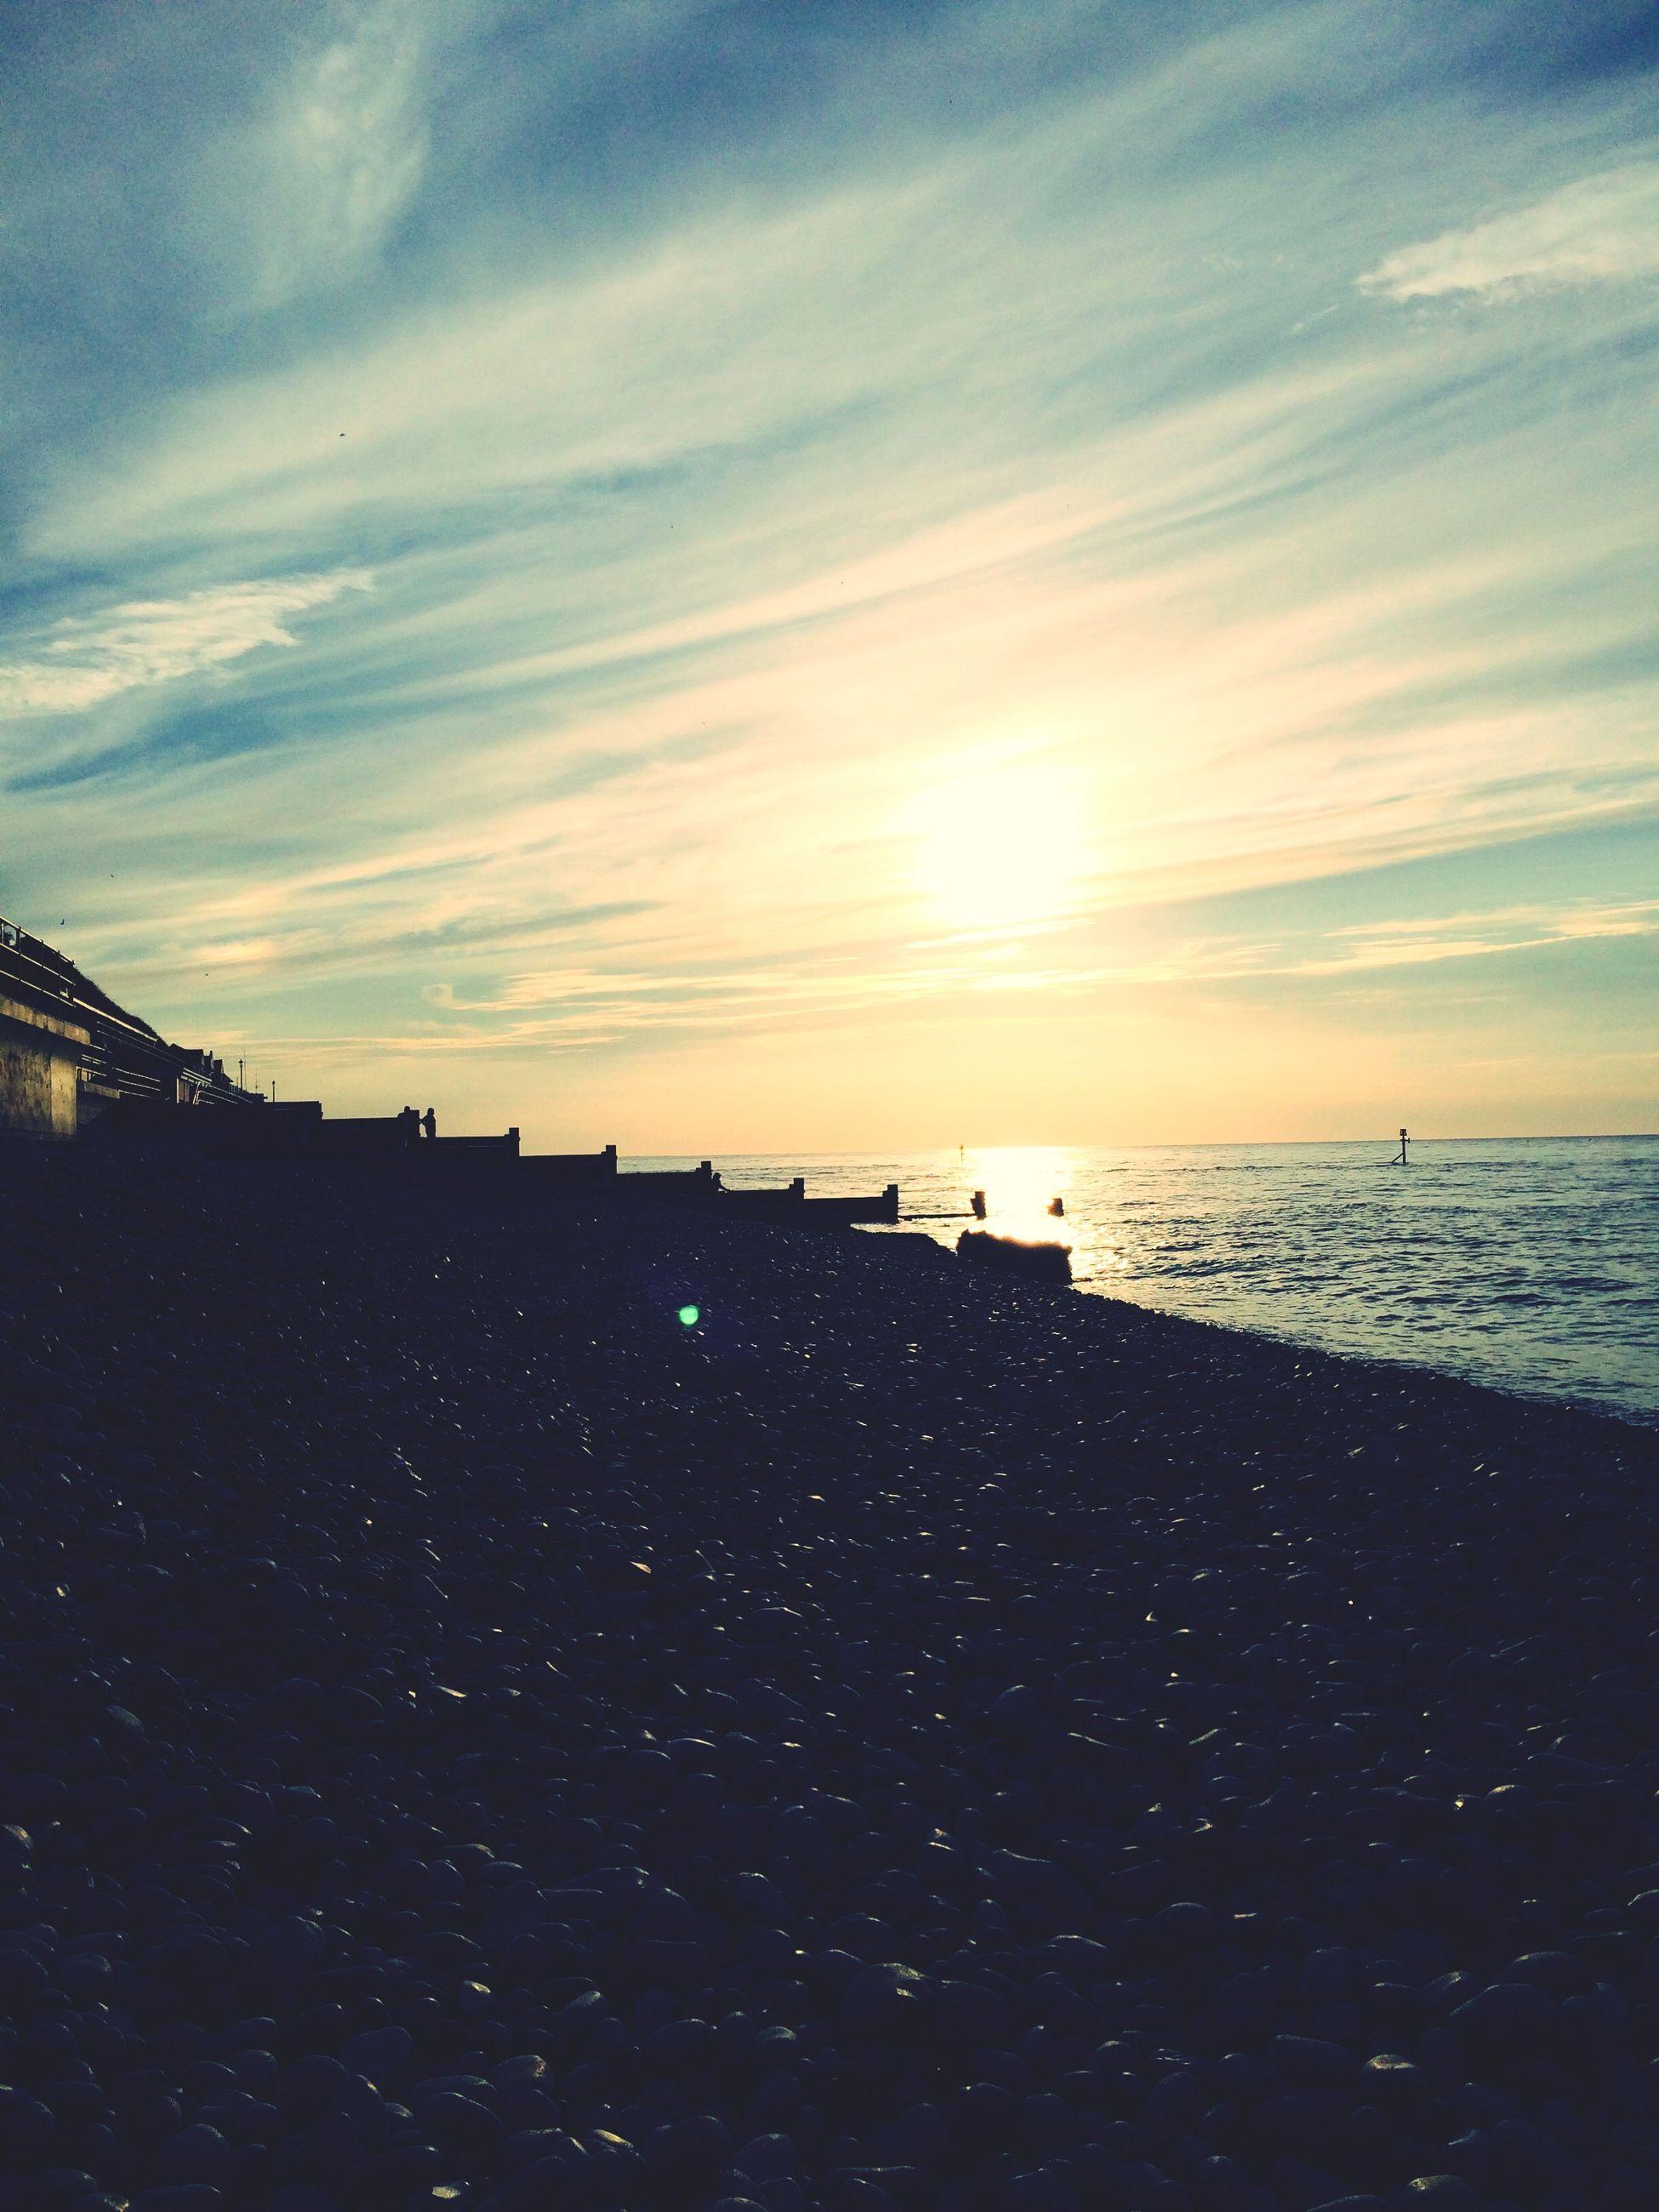 sea, sunset, water, sky, silhouette, horizon over water, scenics, cloud - sky, tranquil scene, beauty in nature, tranquility, nature, cloud, idyllic, beach, dusk, outdoors, orange color, shore, sun